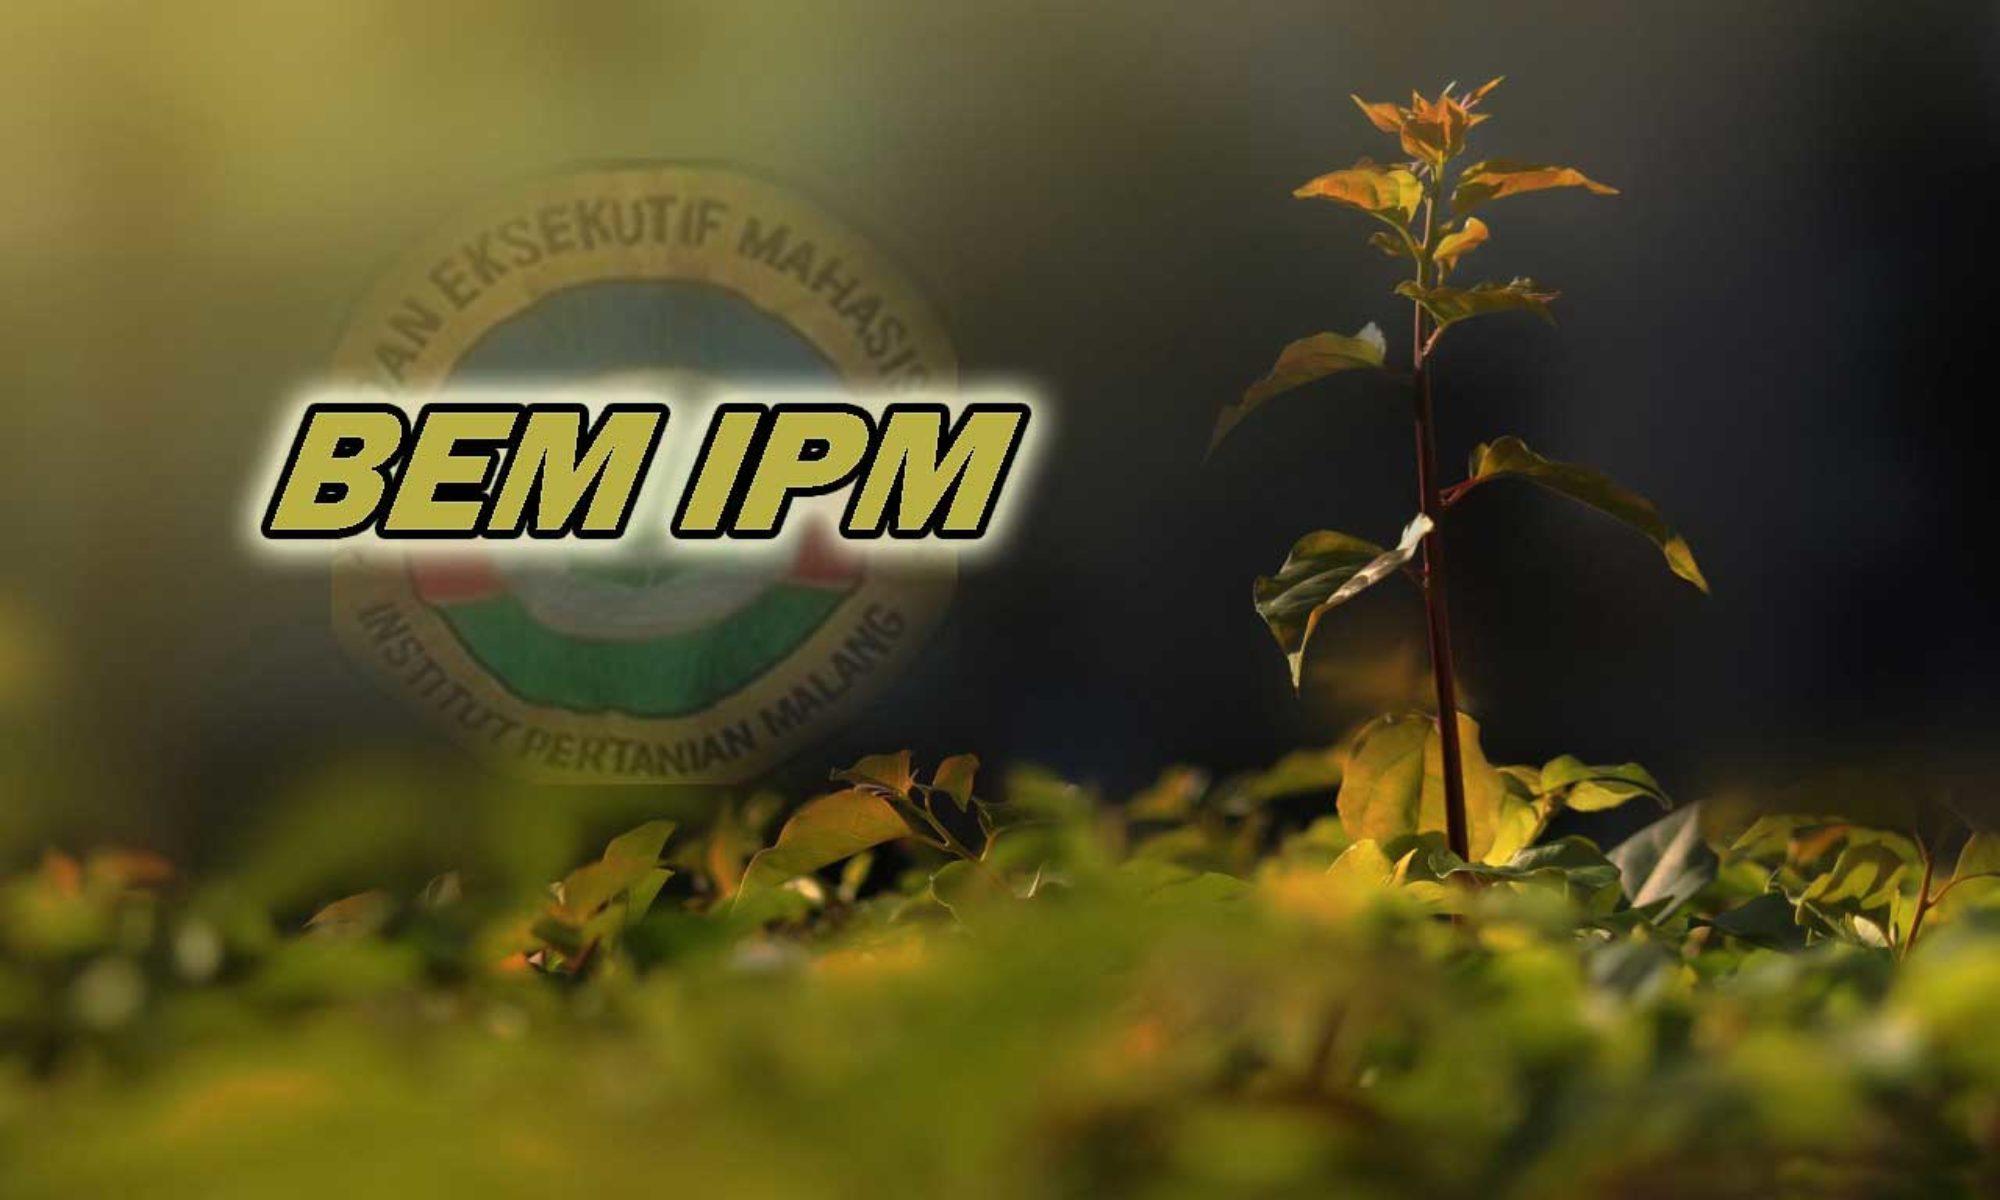 BEM IPM